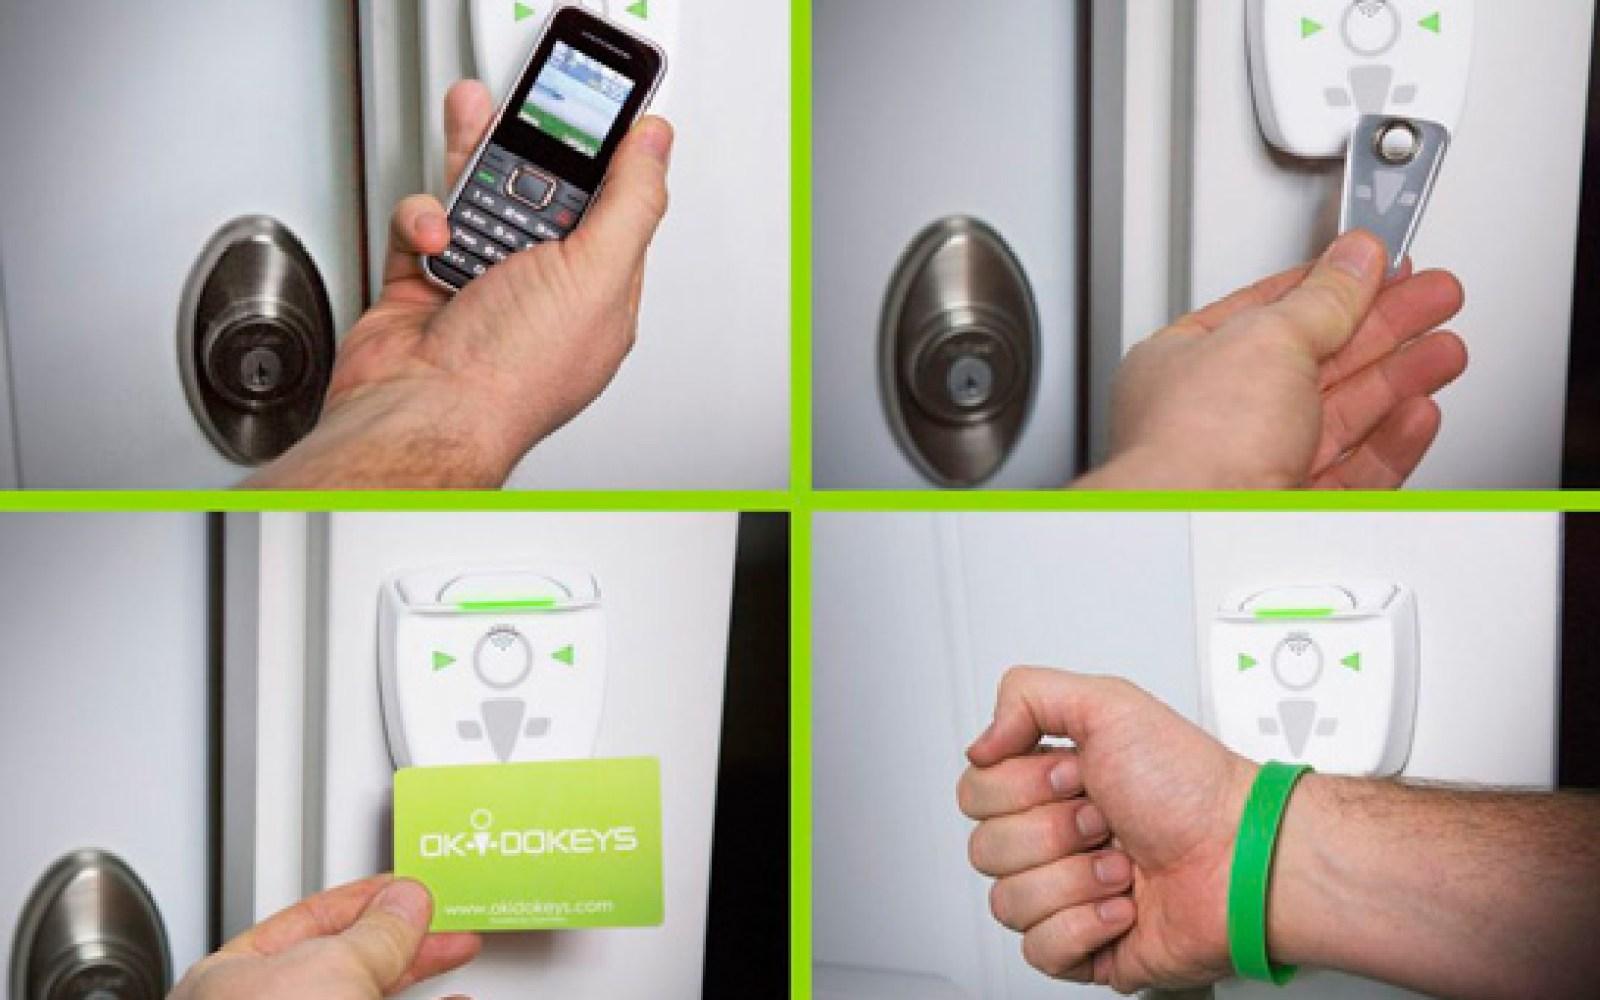 iPhone-controlled door lock market heating up as Openways announces Okidokeys